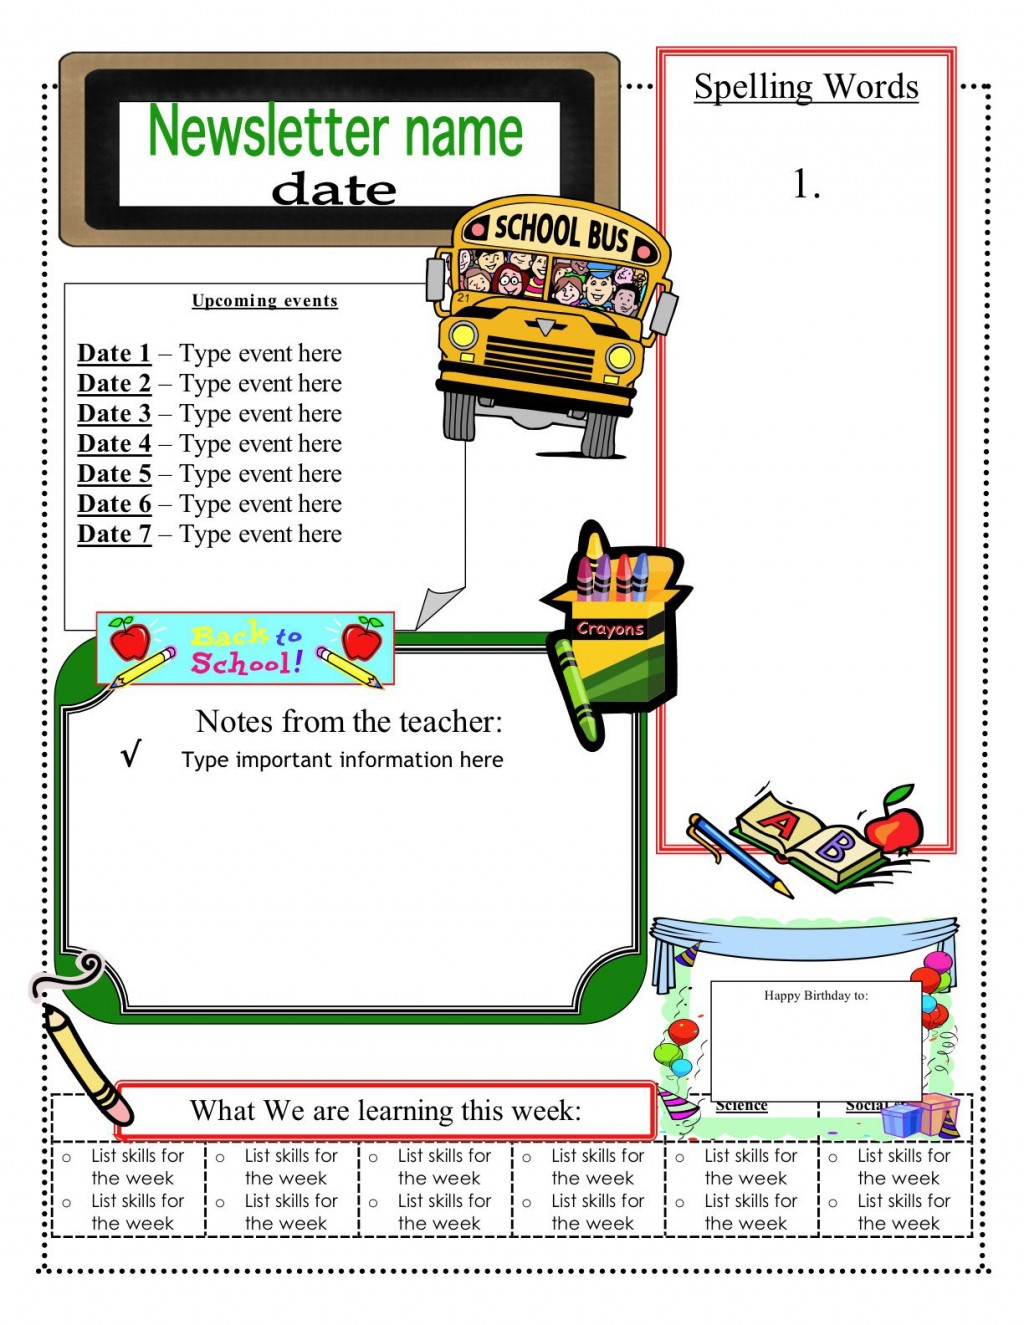 002 Sensational Free Teacher Newsletter Template Sample  Classroom For Microsoft Word Google DocLarge